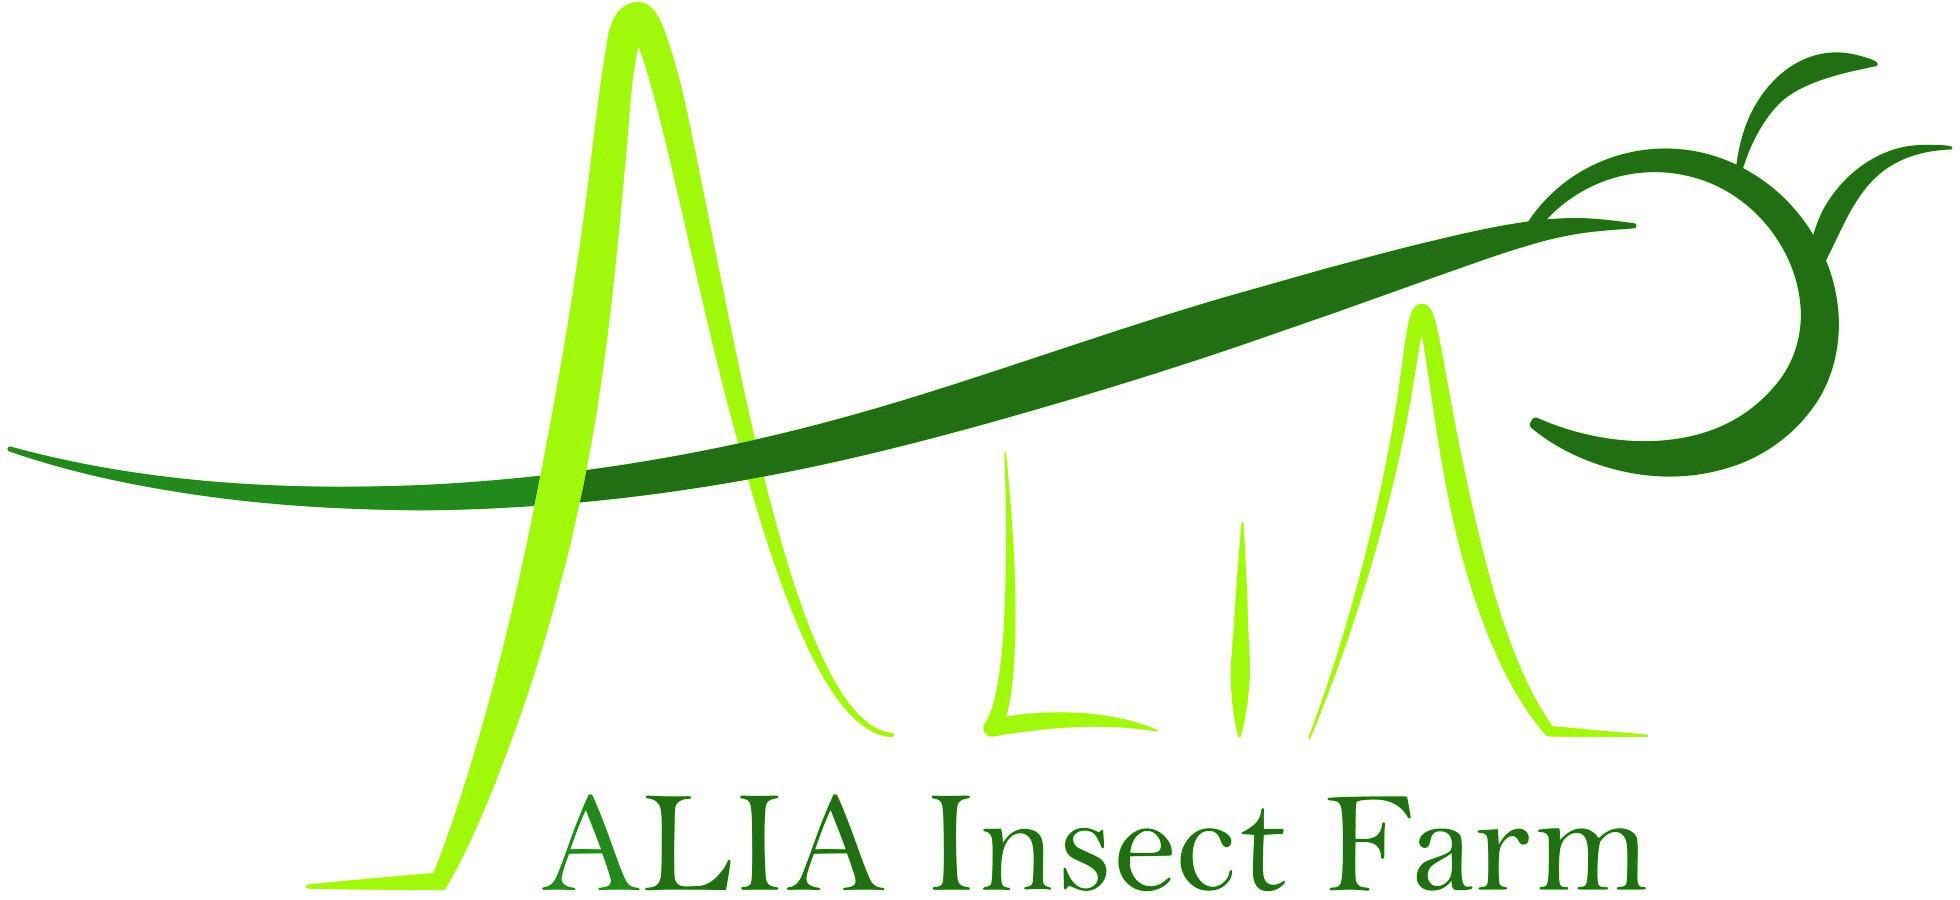 Bildmarke: ALIA Insect Farm